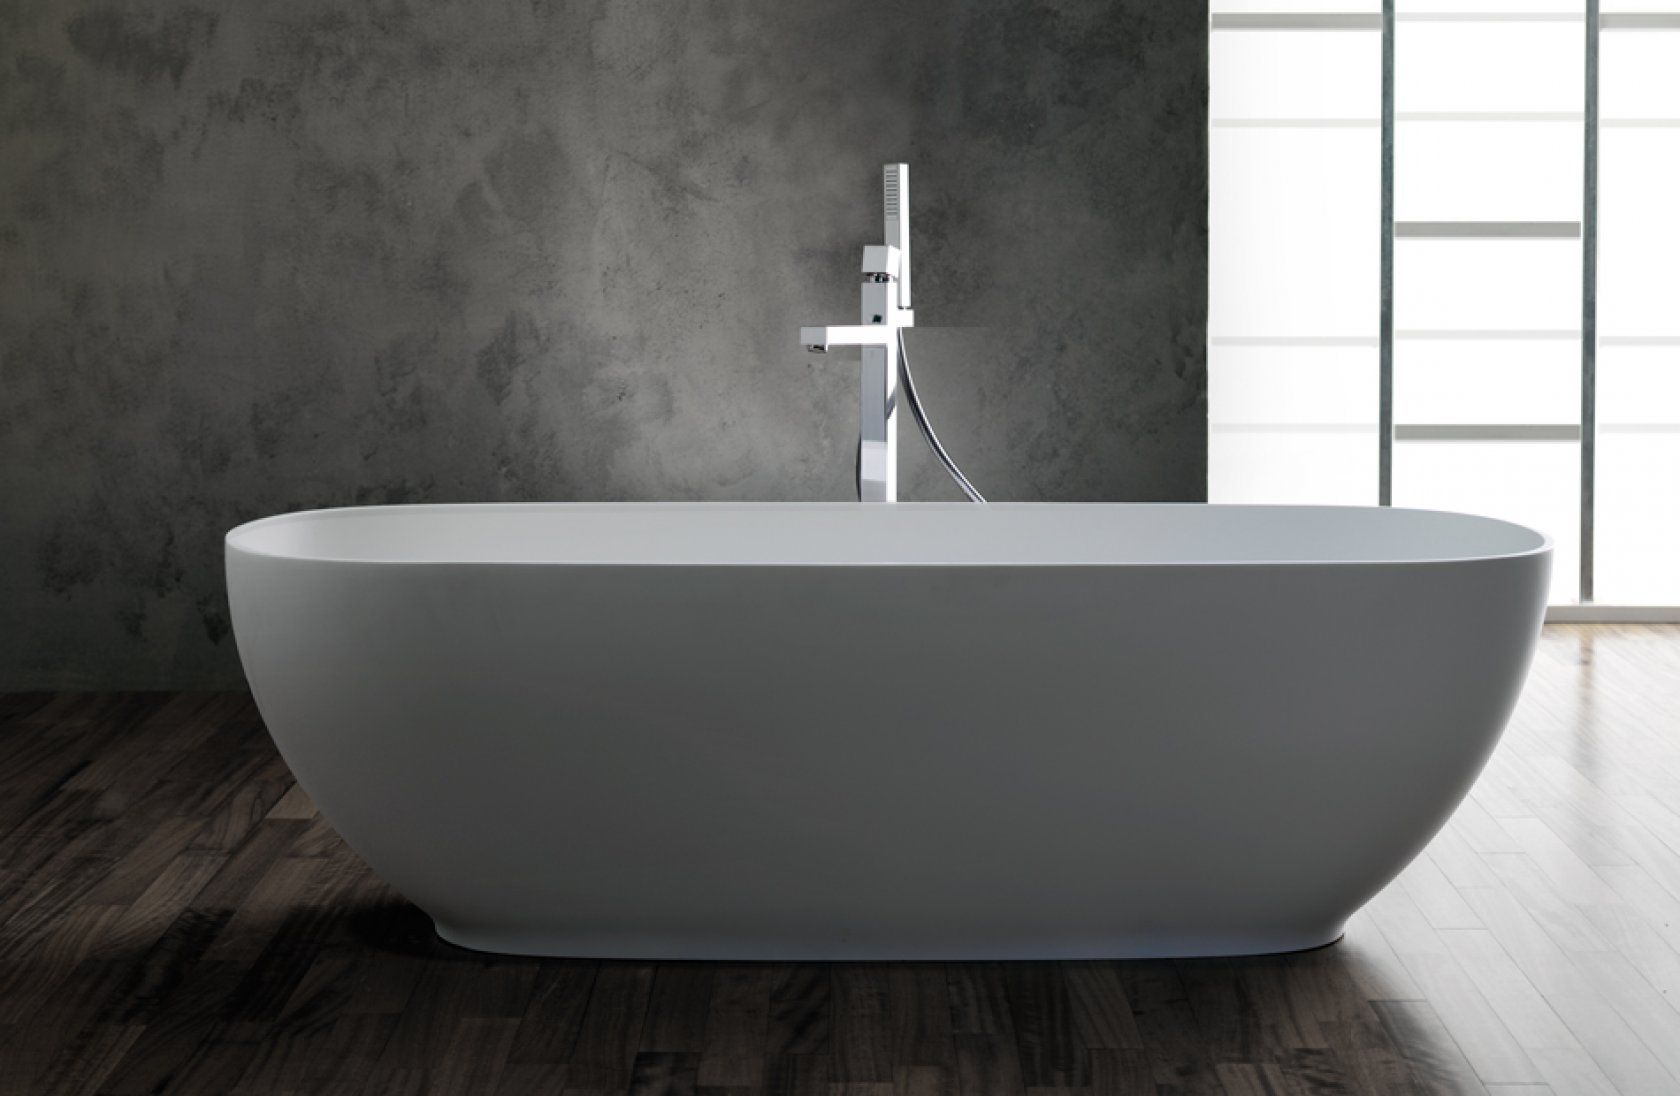 Vasca Da Bagno Karen : Vasca da bagno karen vasca da bagno rovinata ditmas